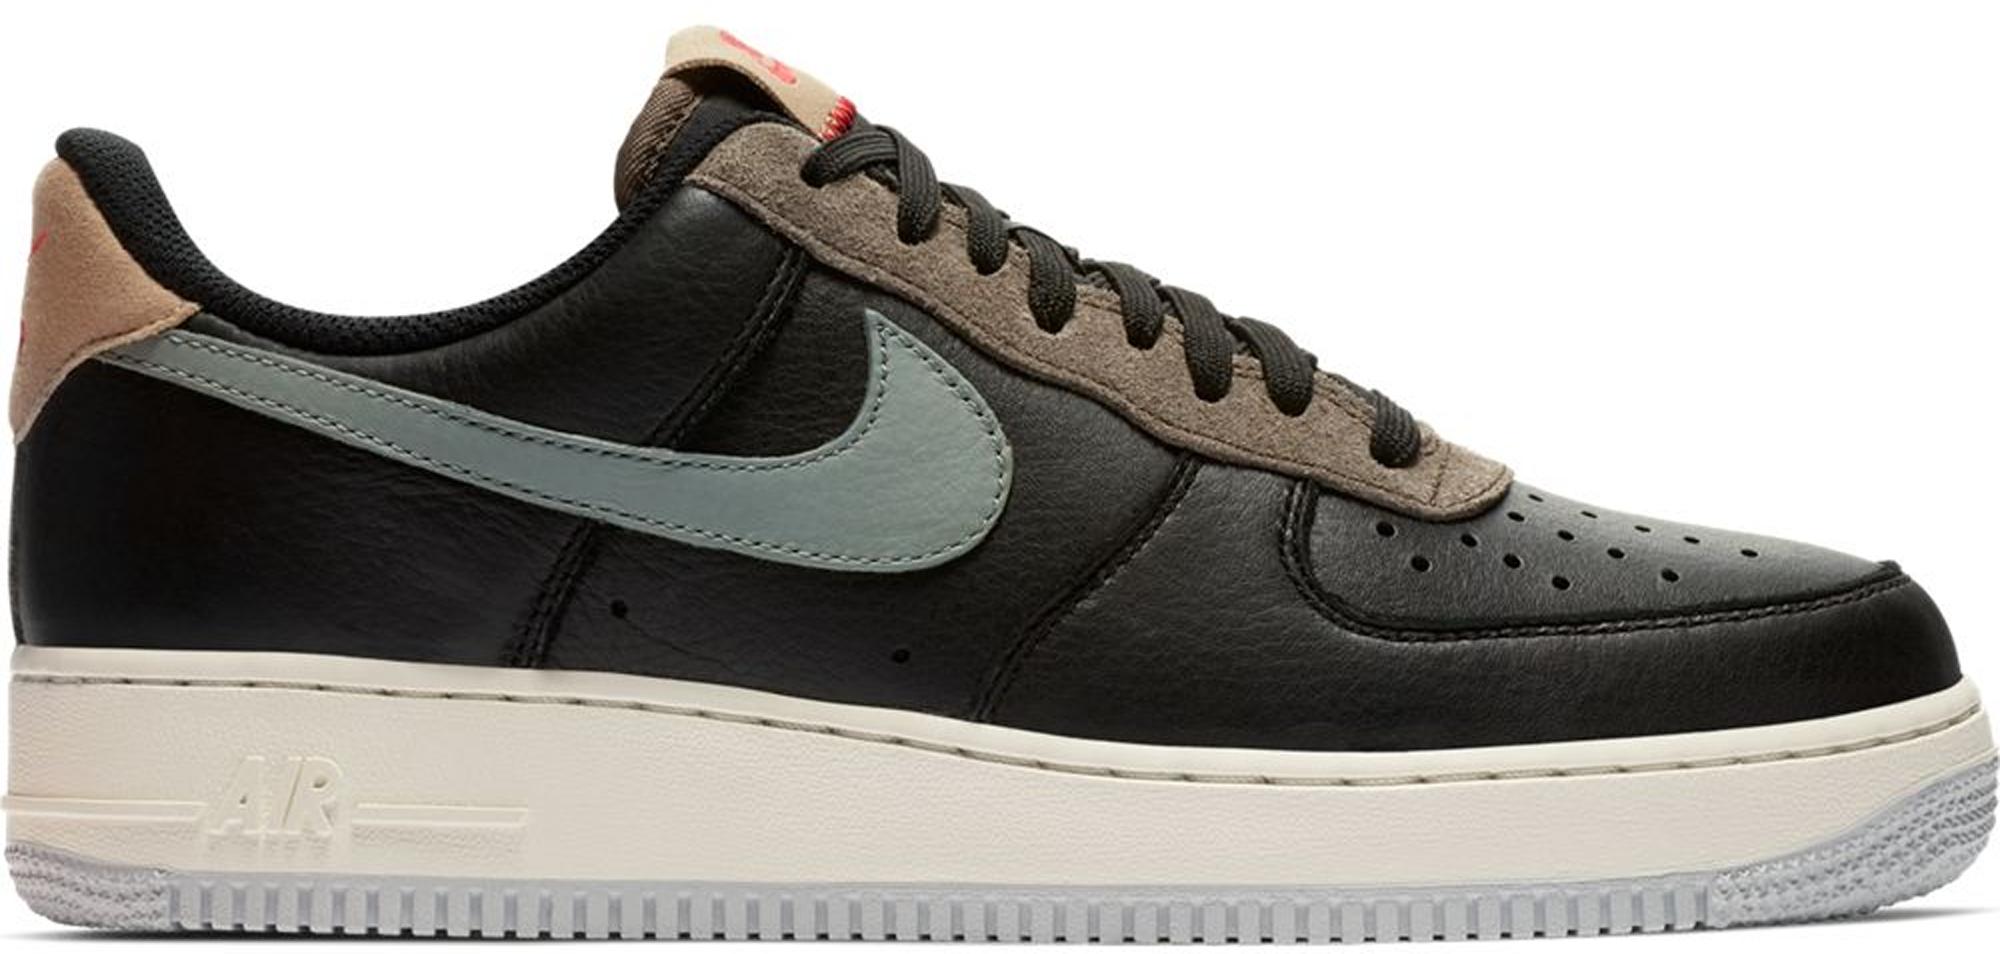 Nike Air Force 1 Low Black Mica Green